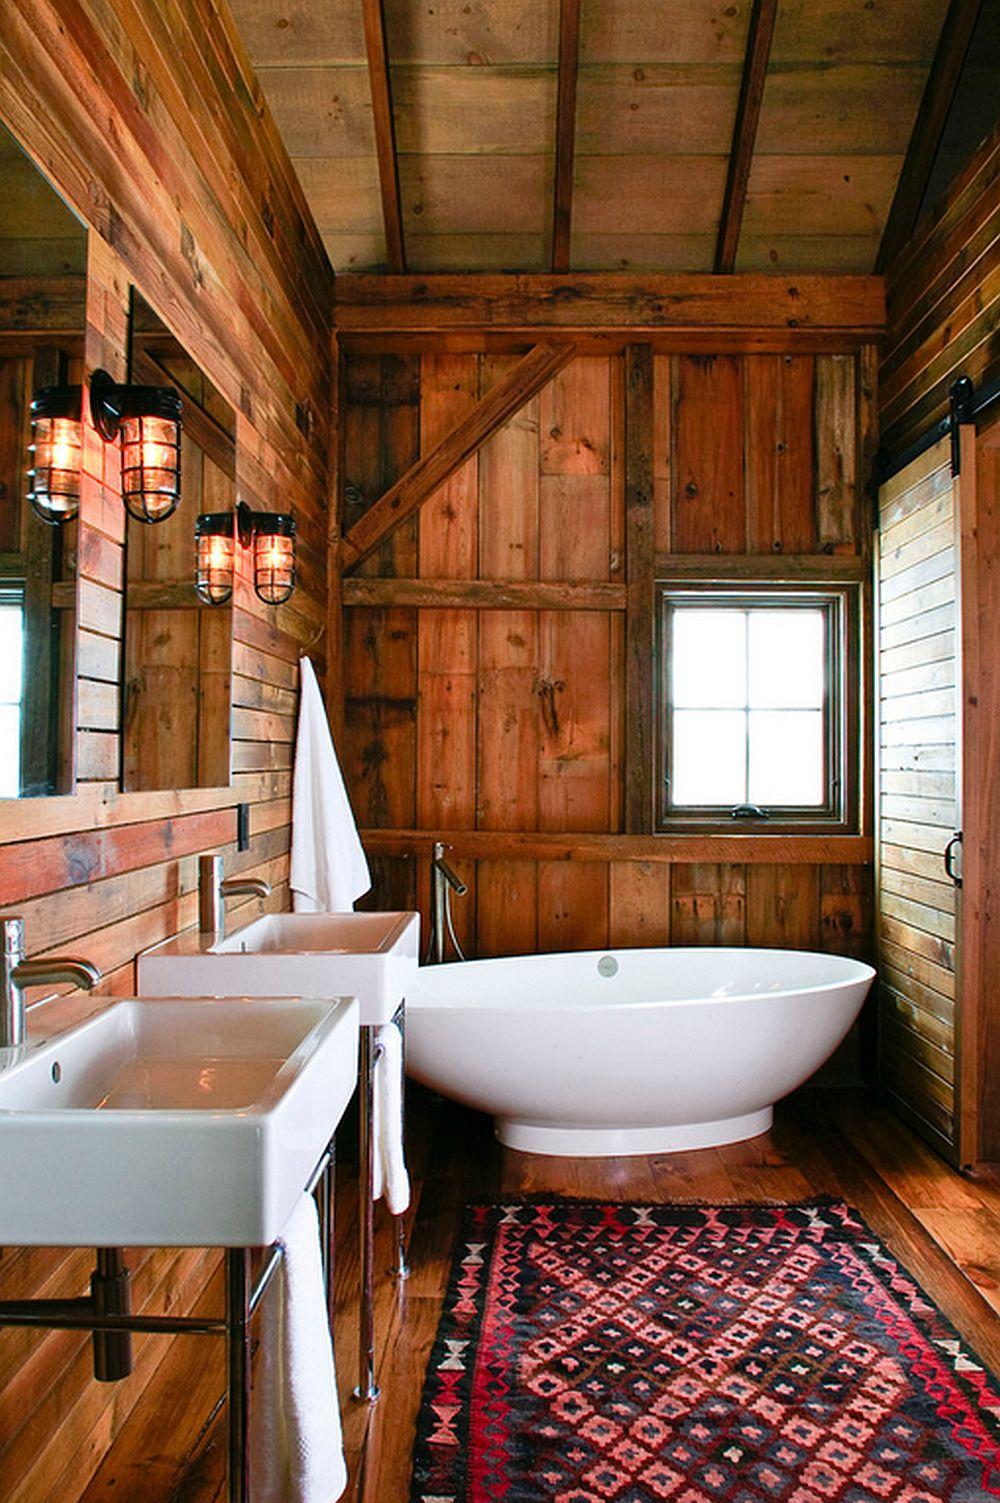 adelaparvu.com despre Michigan Barn, architect Austin DePree, Northworks Architects, baie rustica intr-un hambar modernizat (8)